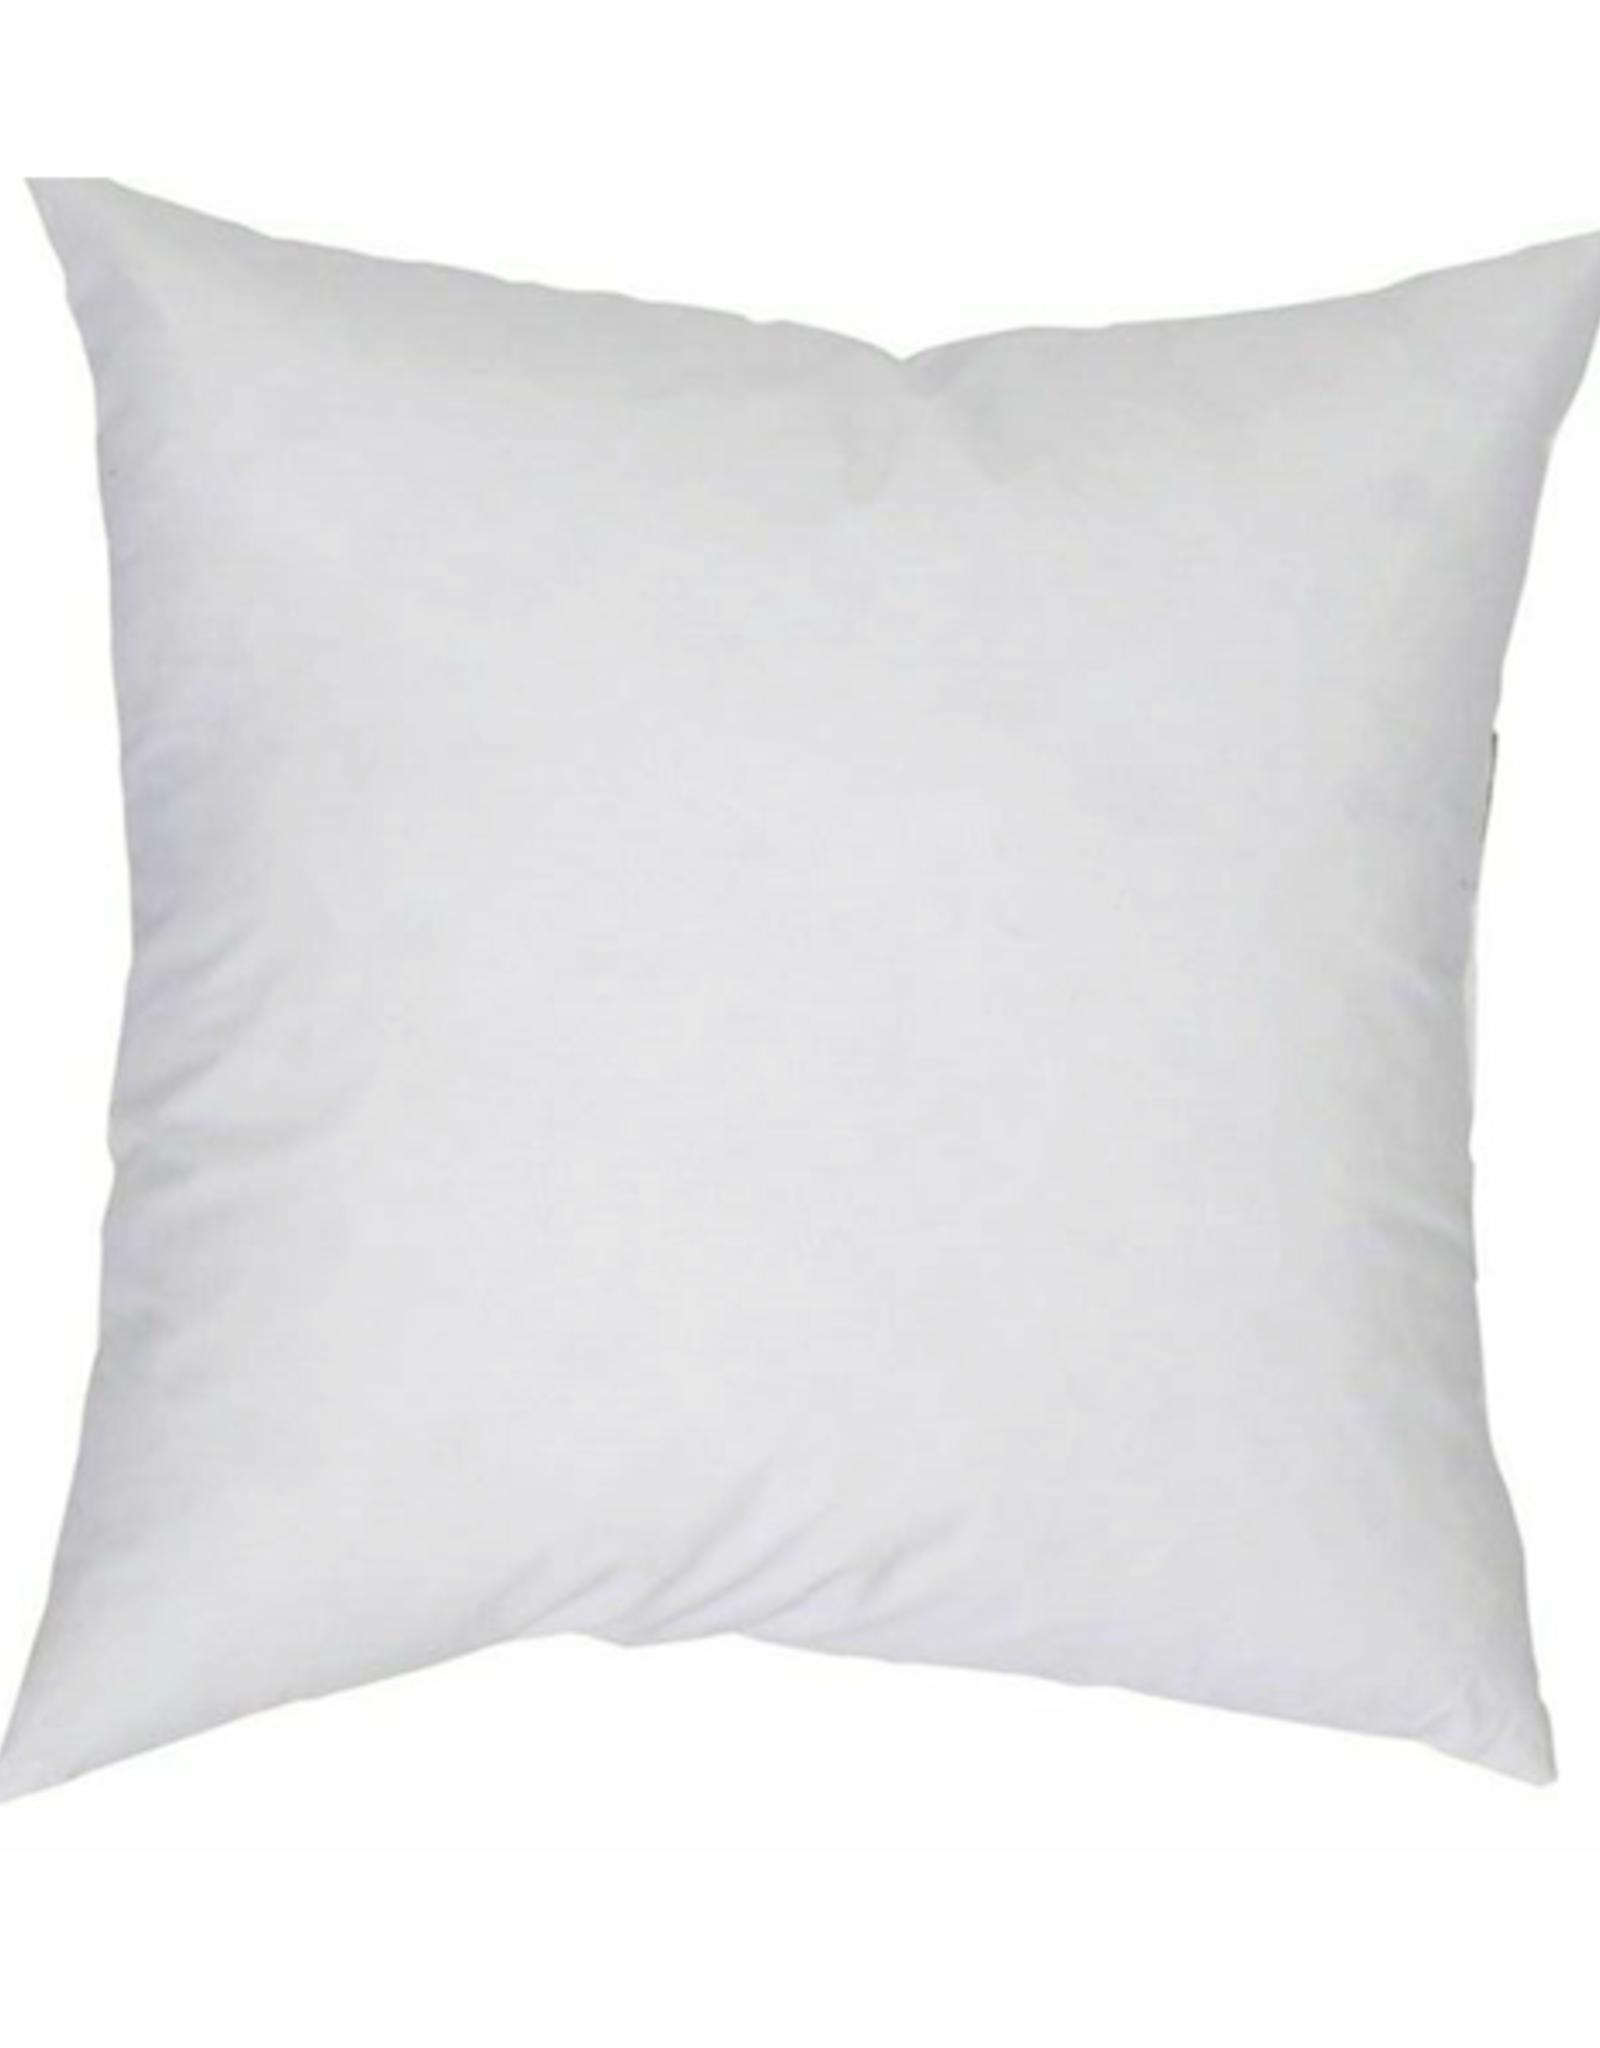 Craft Studio Cushion Insert 40x40